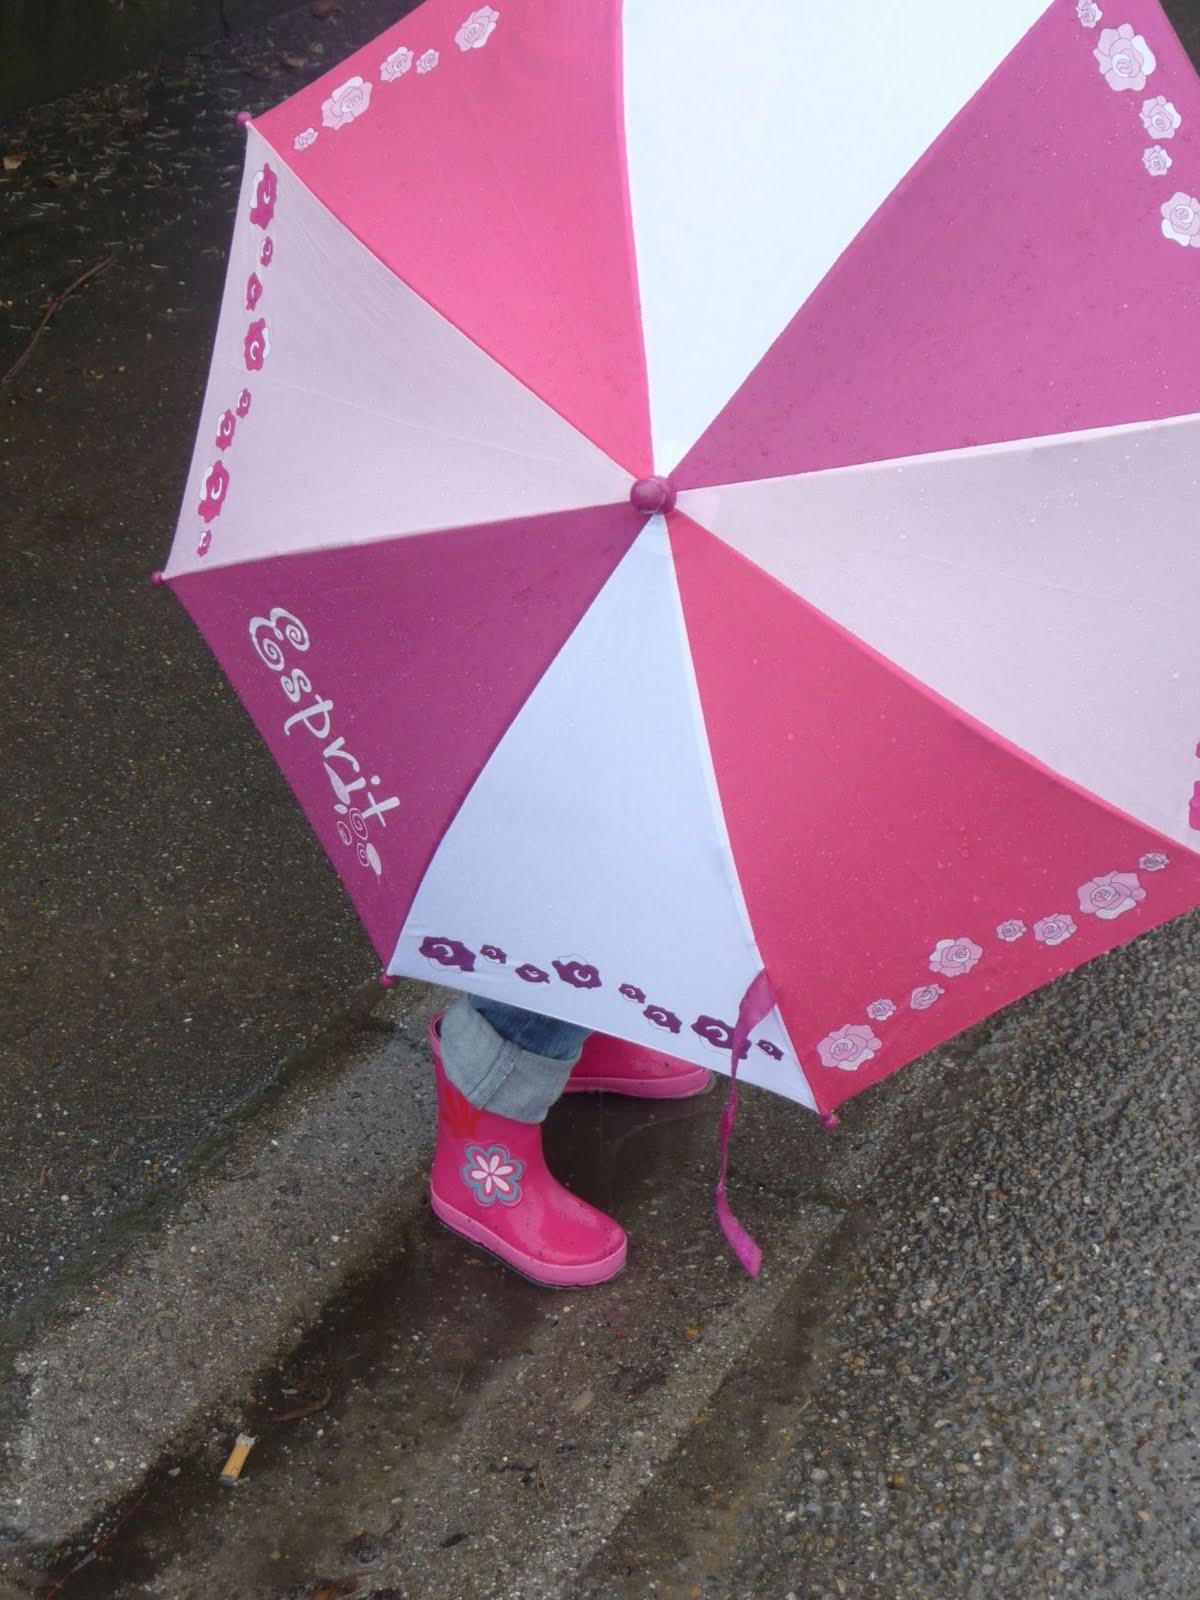 Meine Grune Wiese Regenschirme